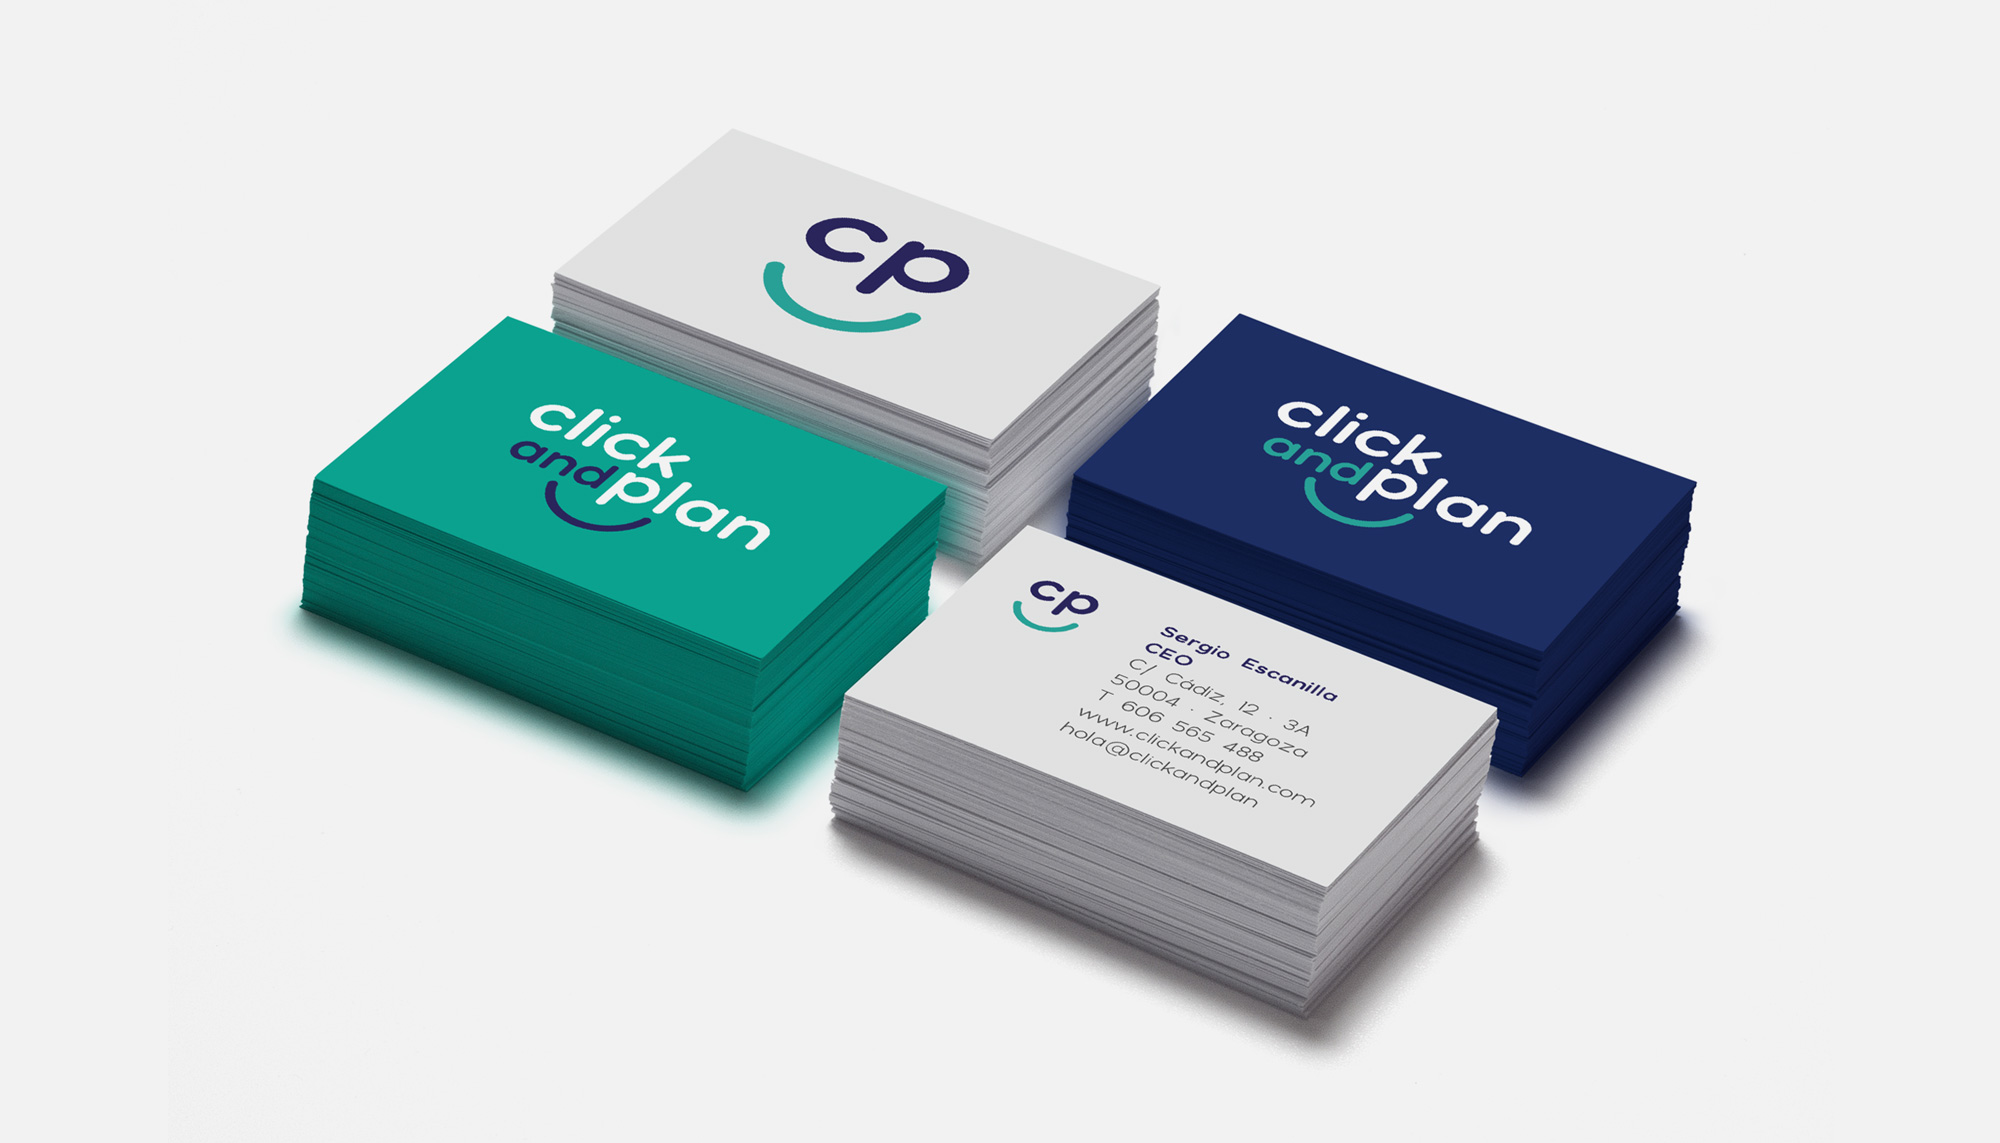 Imagen Corporativa App Click and Plan